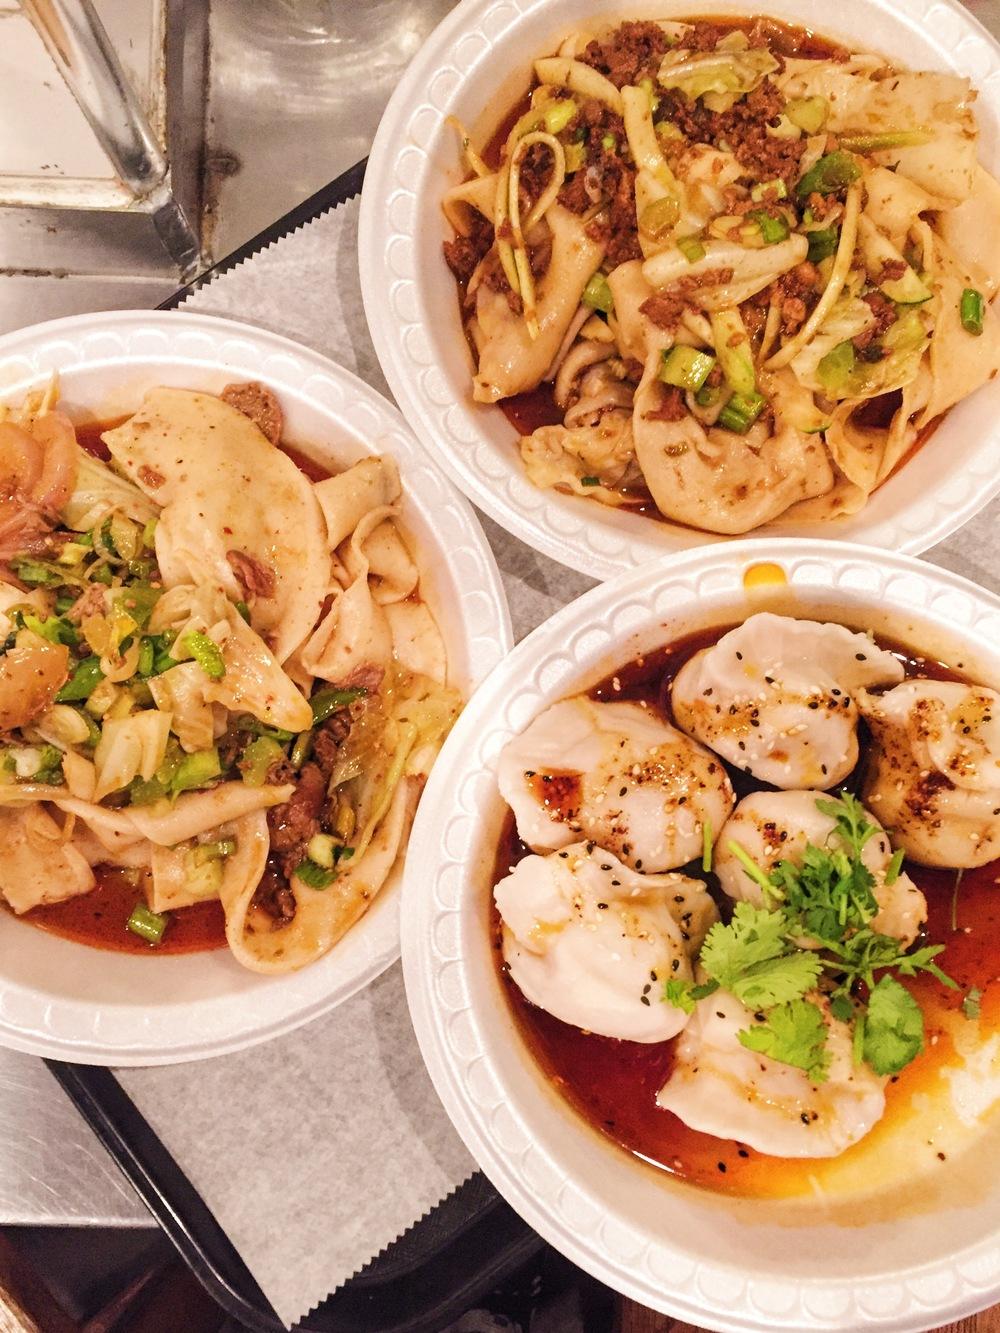 Spicy lamb noodles, spicy pork noodles, beef/pork dumplings at Xian's Famous Foods